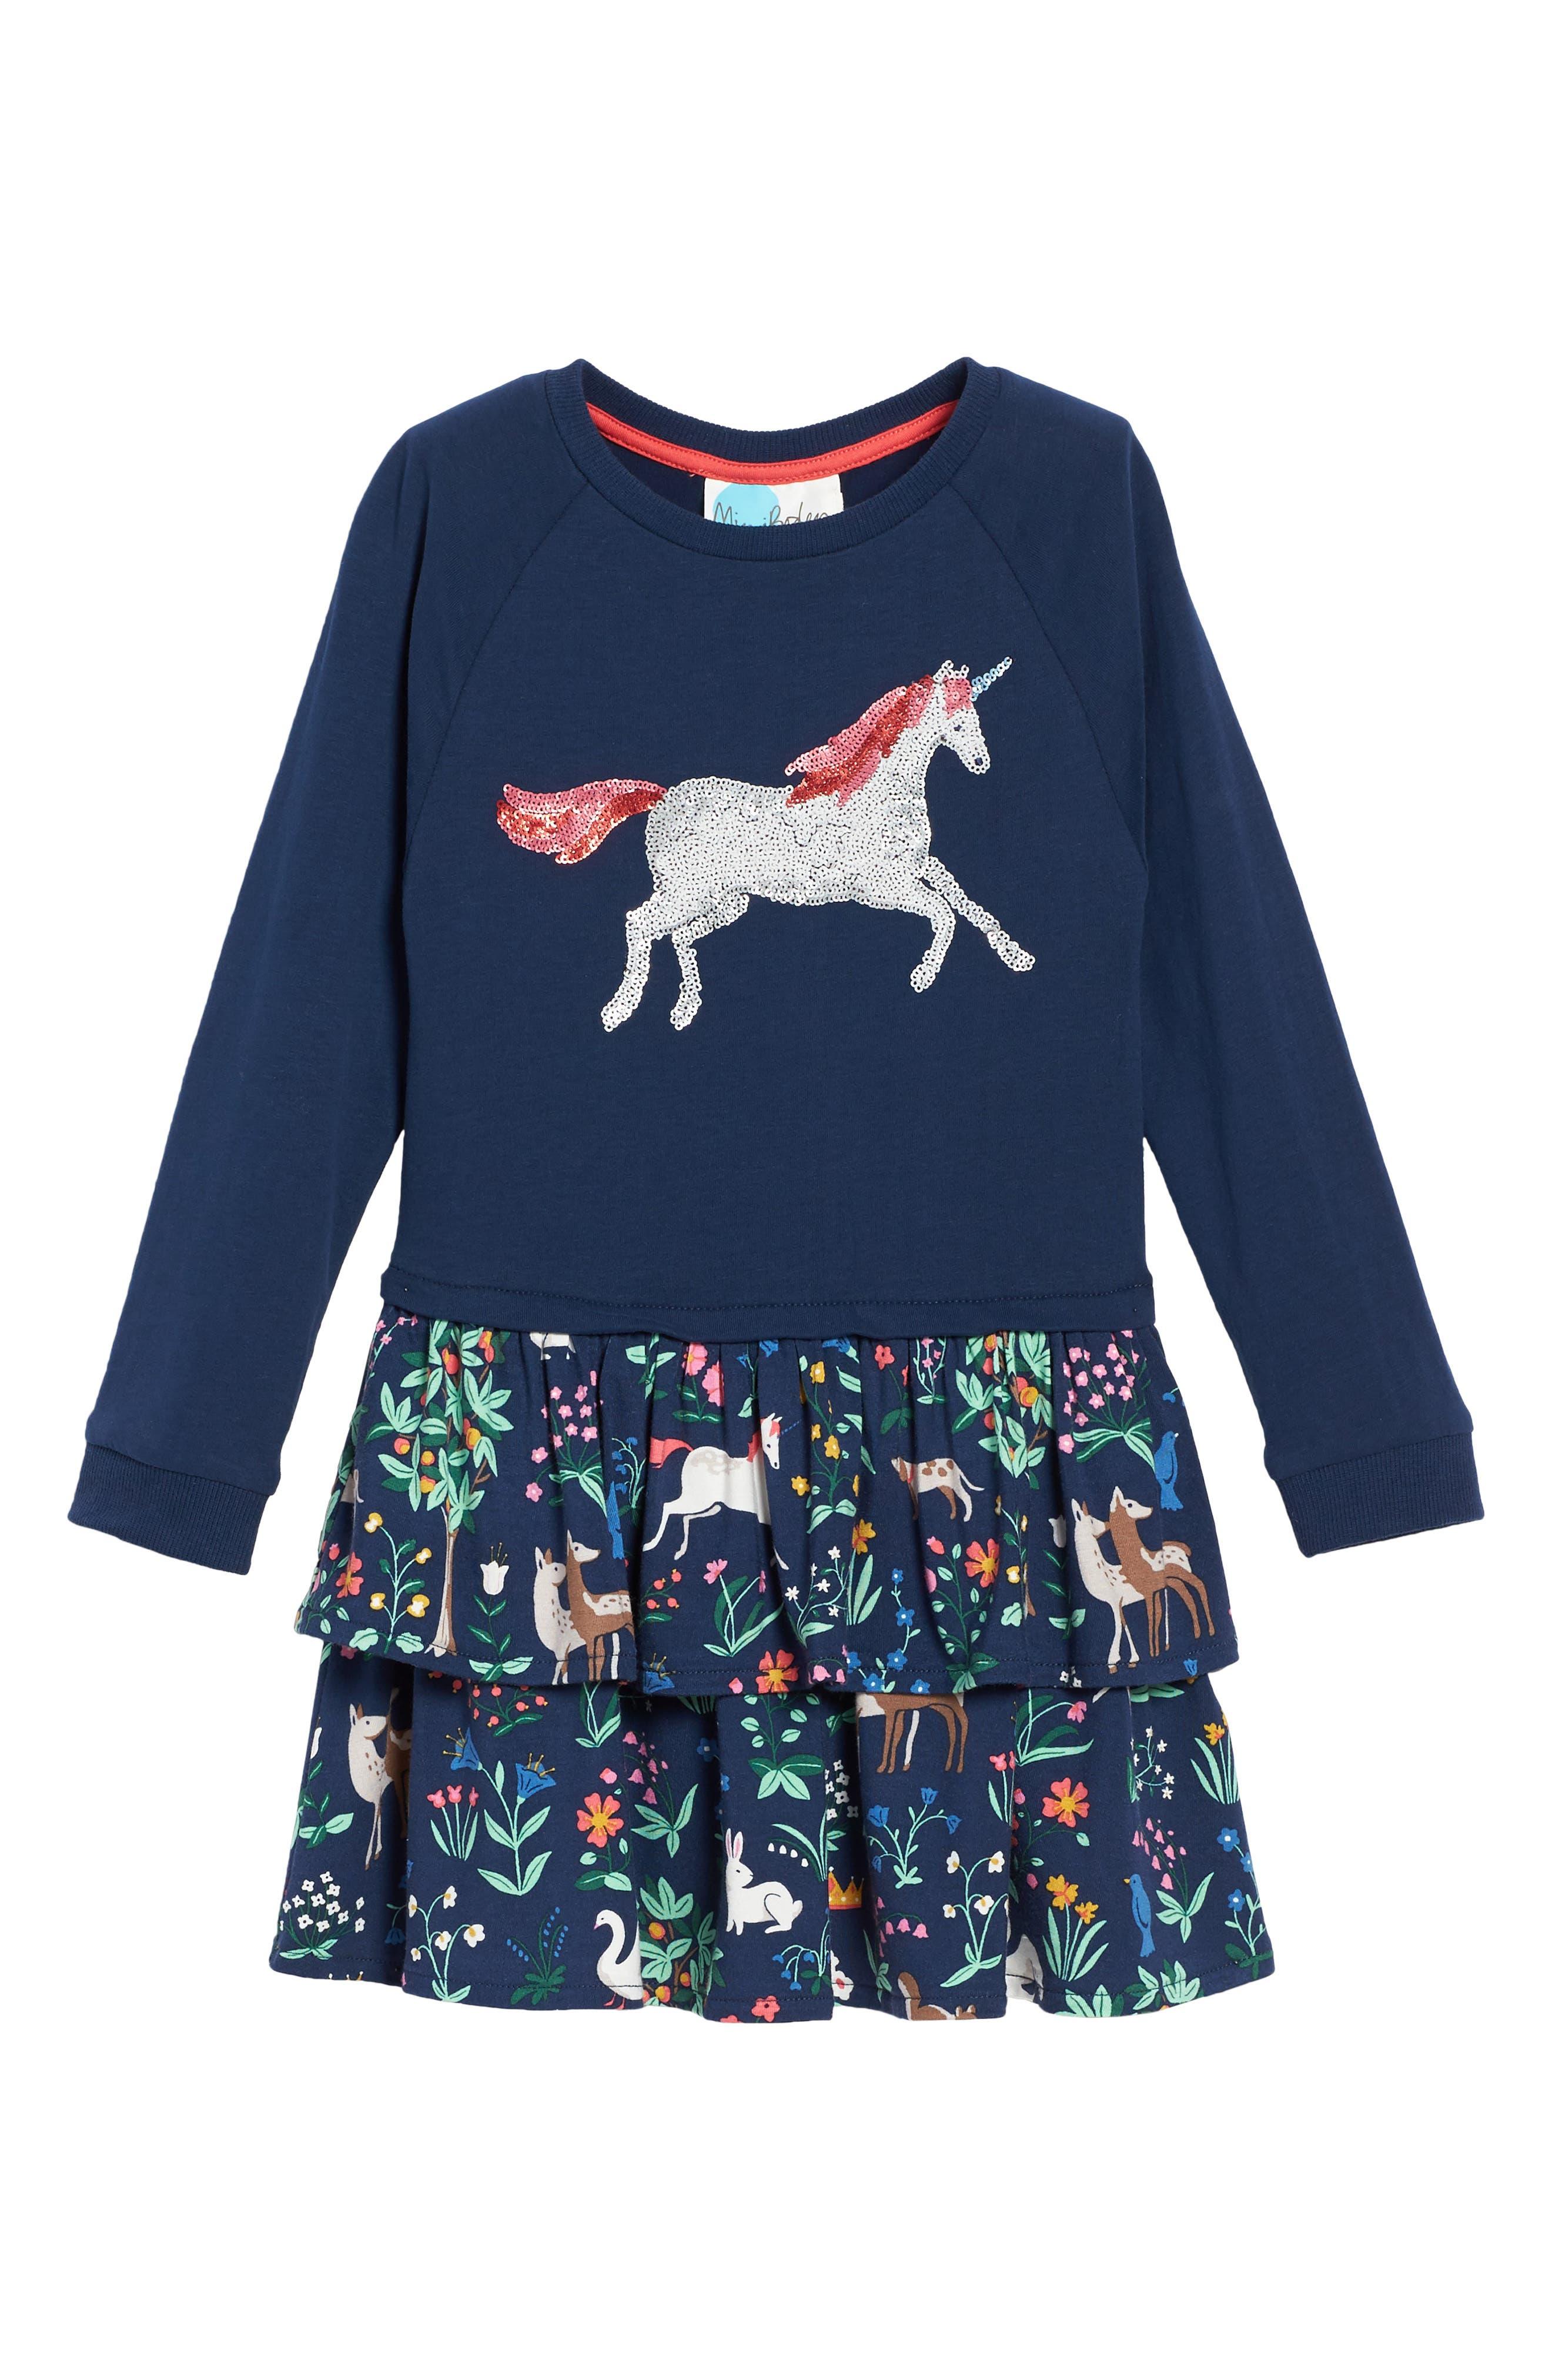 Main Image - Mini Boden Twirly Sequin Dress (Toddler Girls, Little Girls & Big Girls)